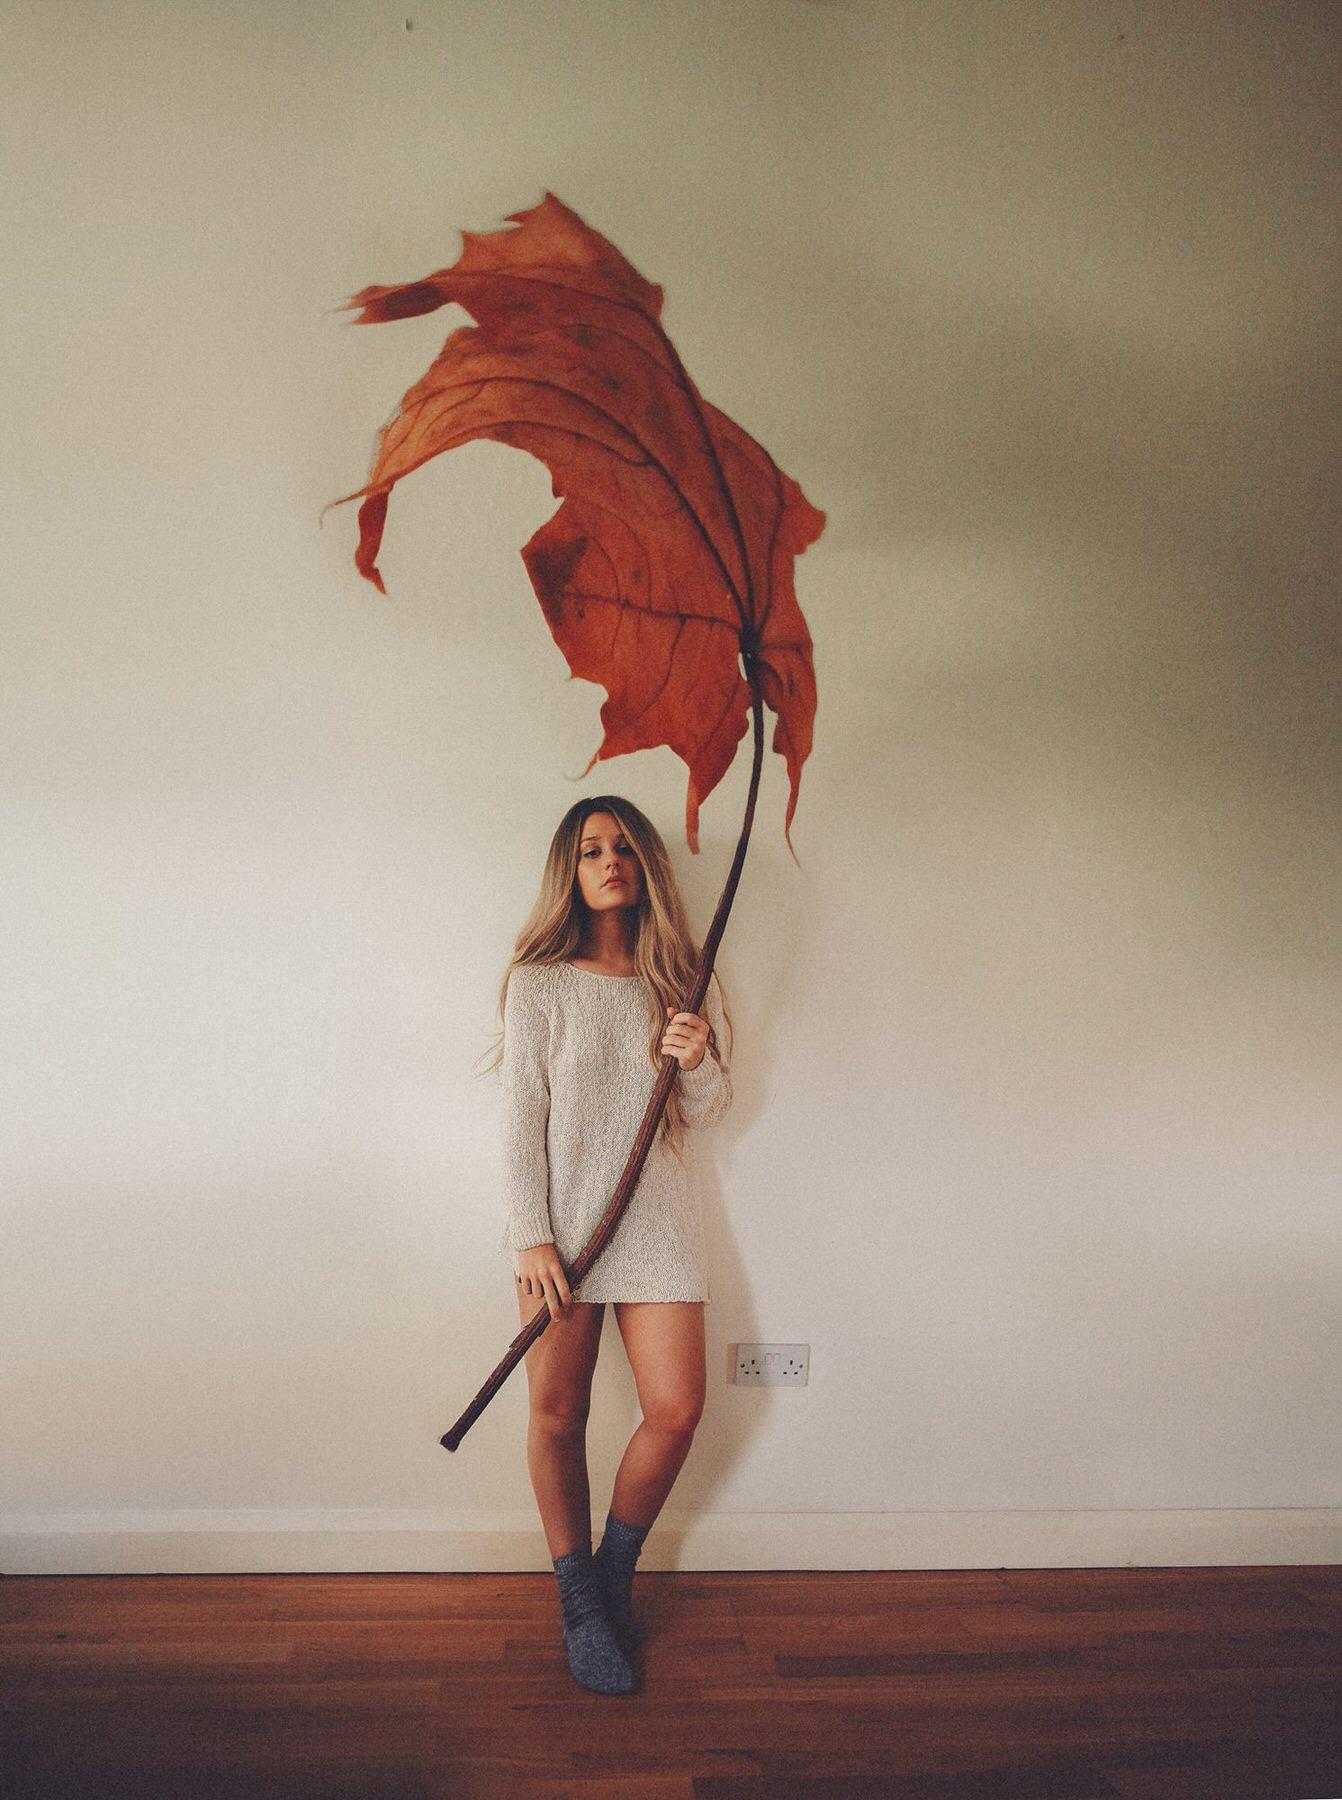 Rosie Hardy Giant Leaf Photo